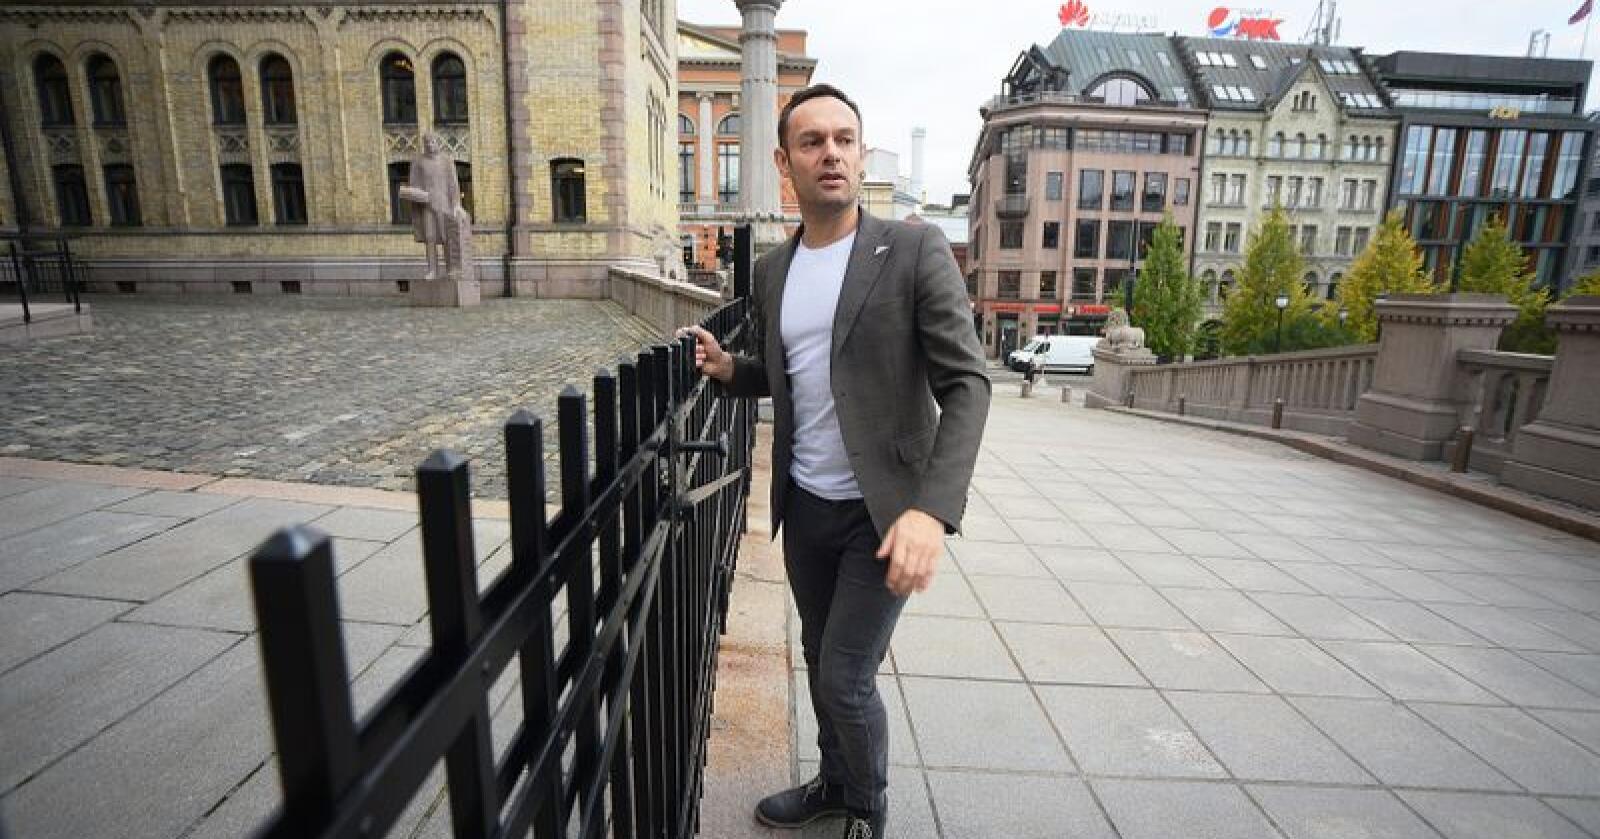 Torgeir Knag Fylkesnes (SV) angriper Senterpartiet, som i hans øyne ikke tar klima på alvor. Foto: Siri Juell Rasmussen